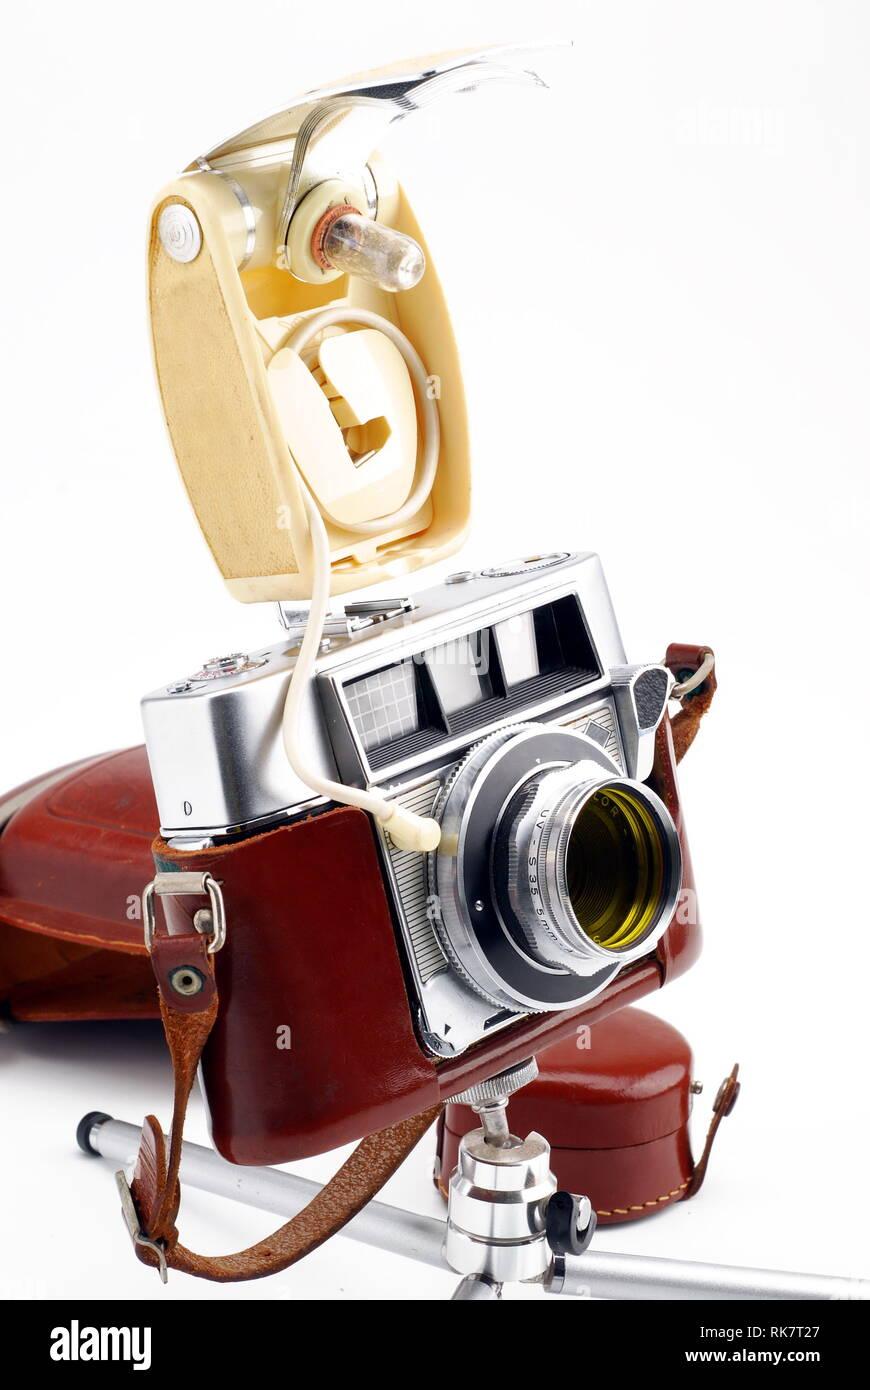 analog camera and flash on a white background Stock Photo